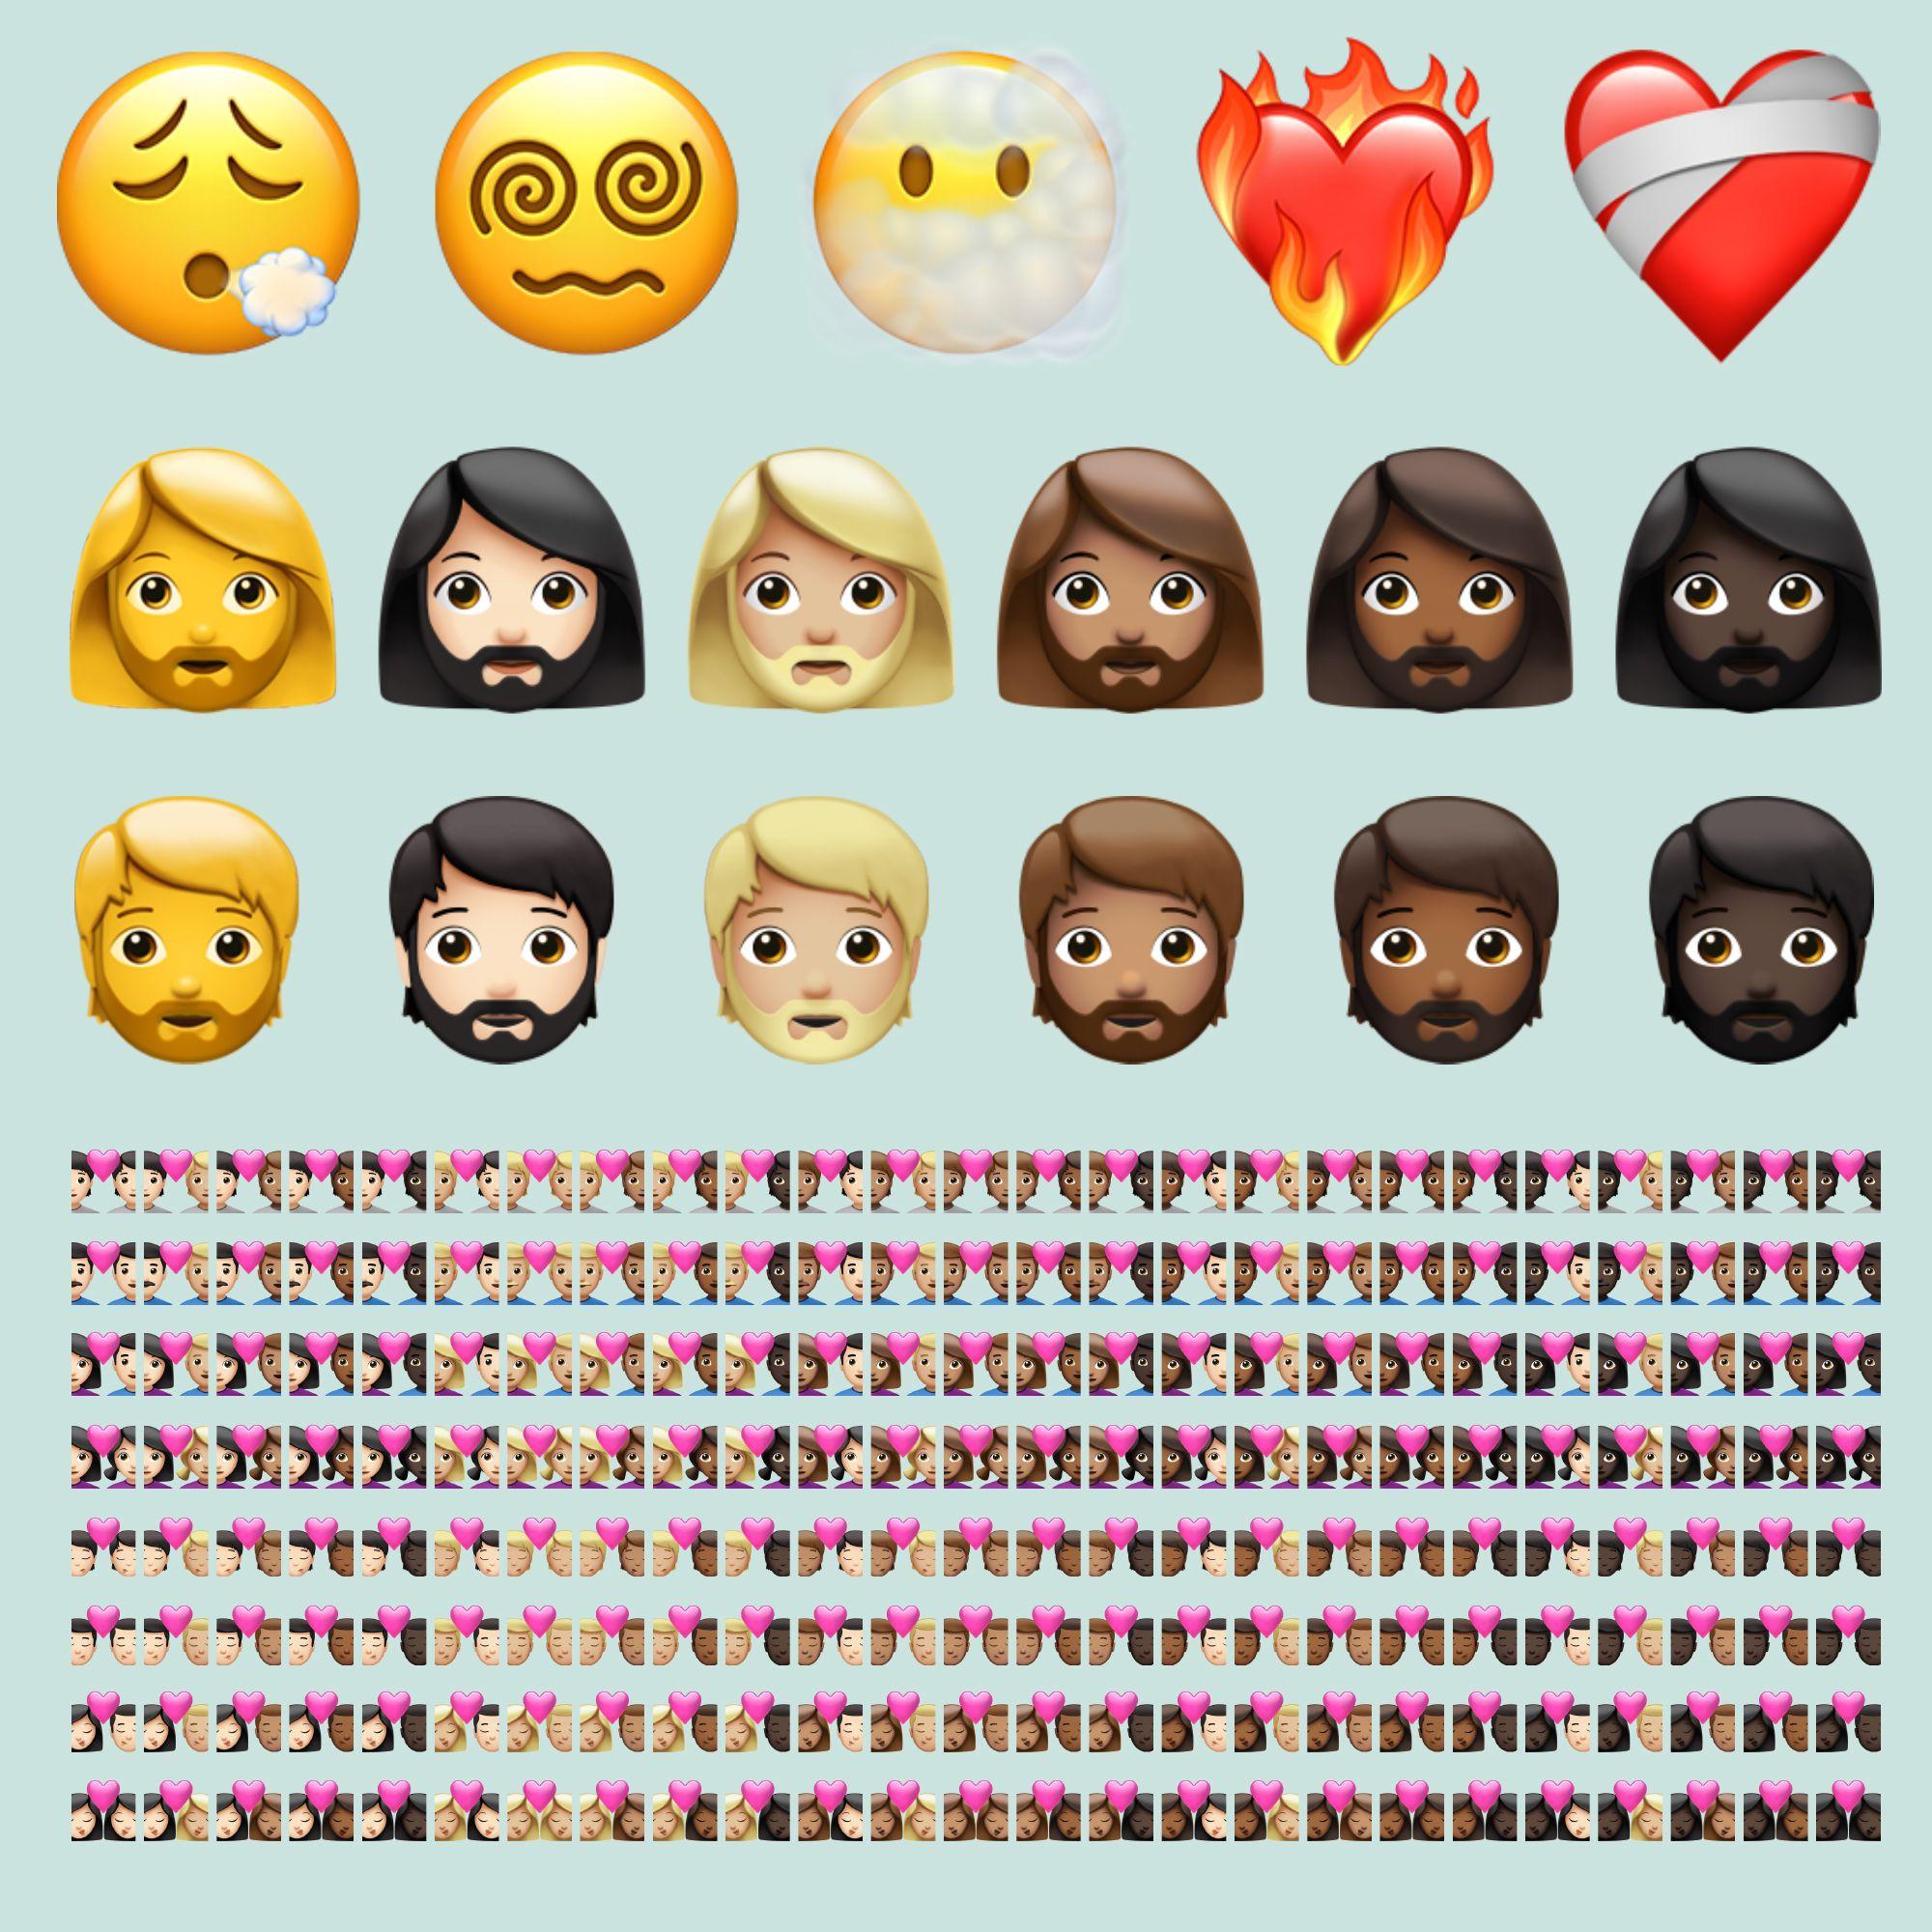 Emojipedia-iOS-14.5-Emoji-Changelog-All-New-Emoji-13_1-Emojis-3